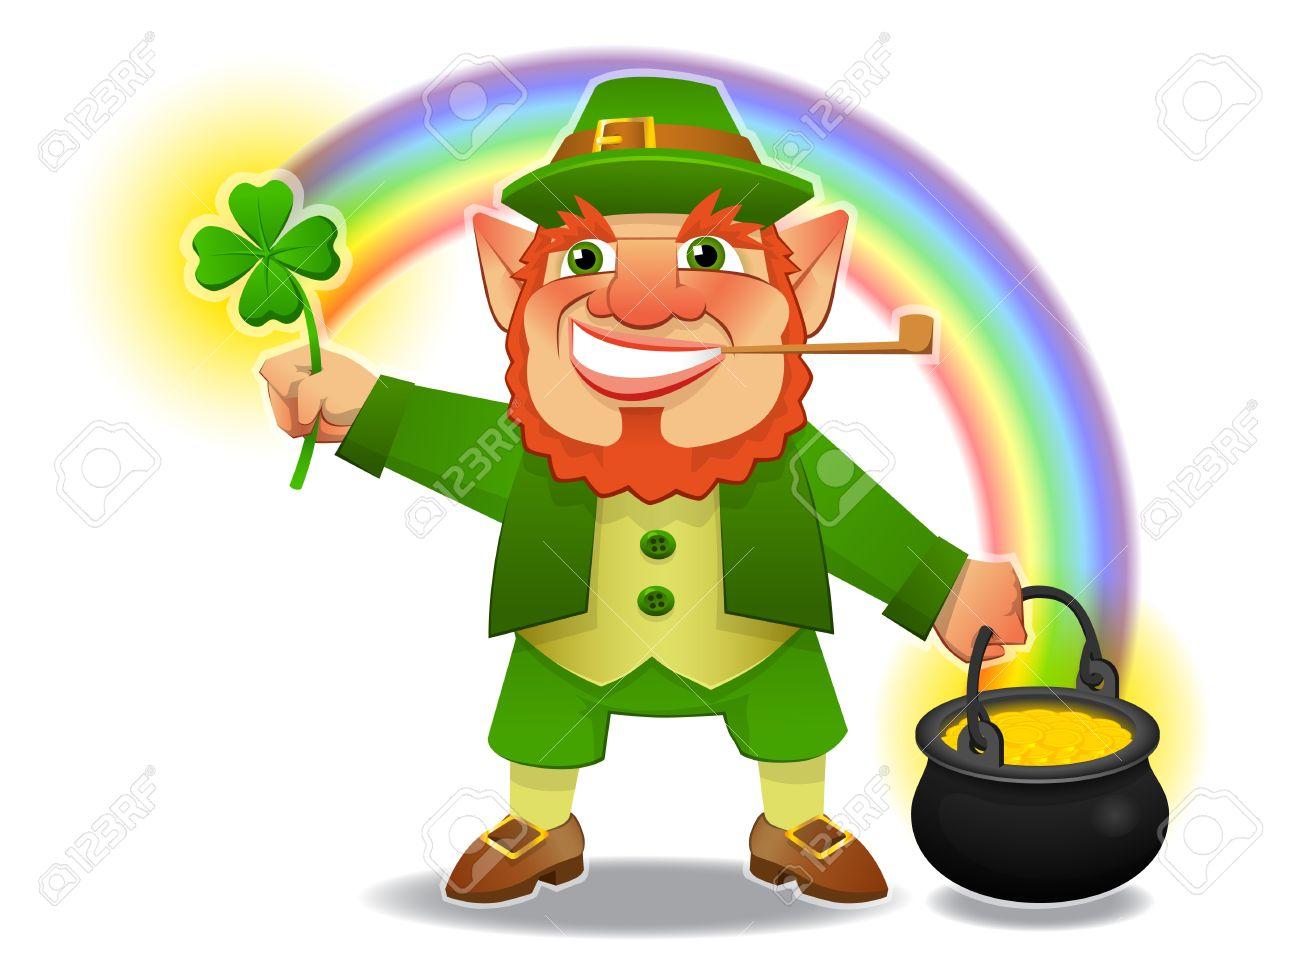 Uncategorized Are Leprechauns Irish lucky leprechaun with shamrock and treasure royalty free cliparts stock vector 10711921